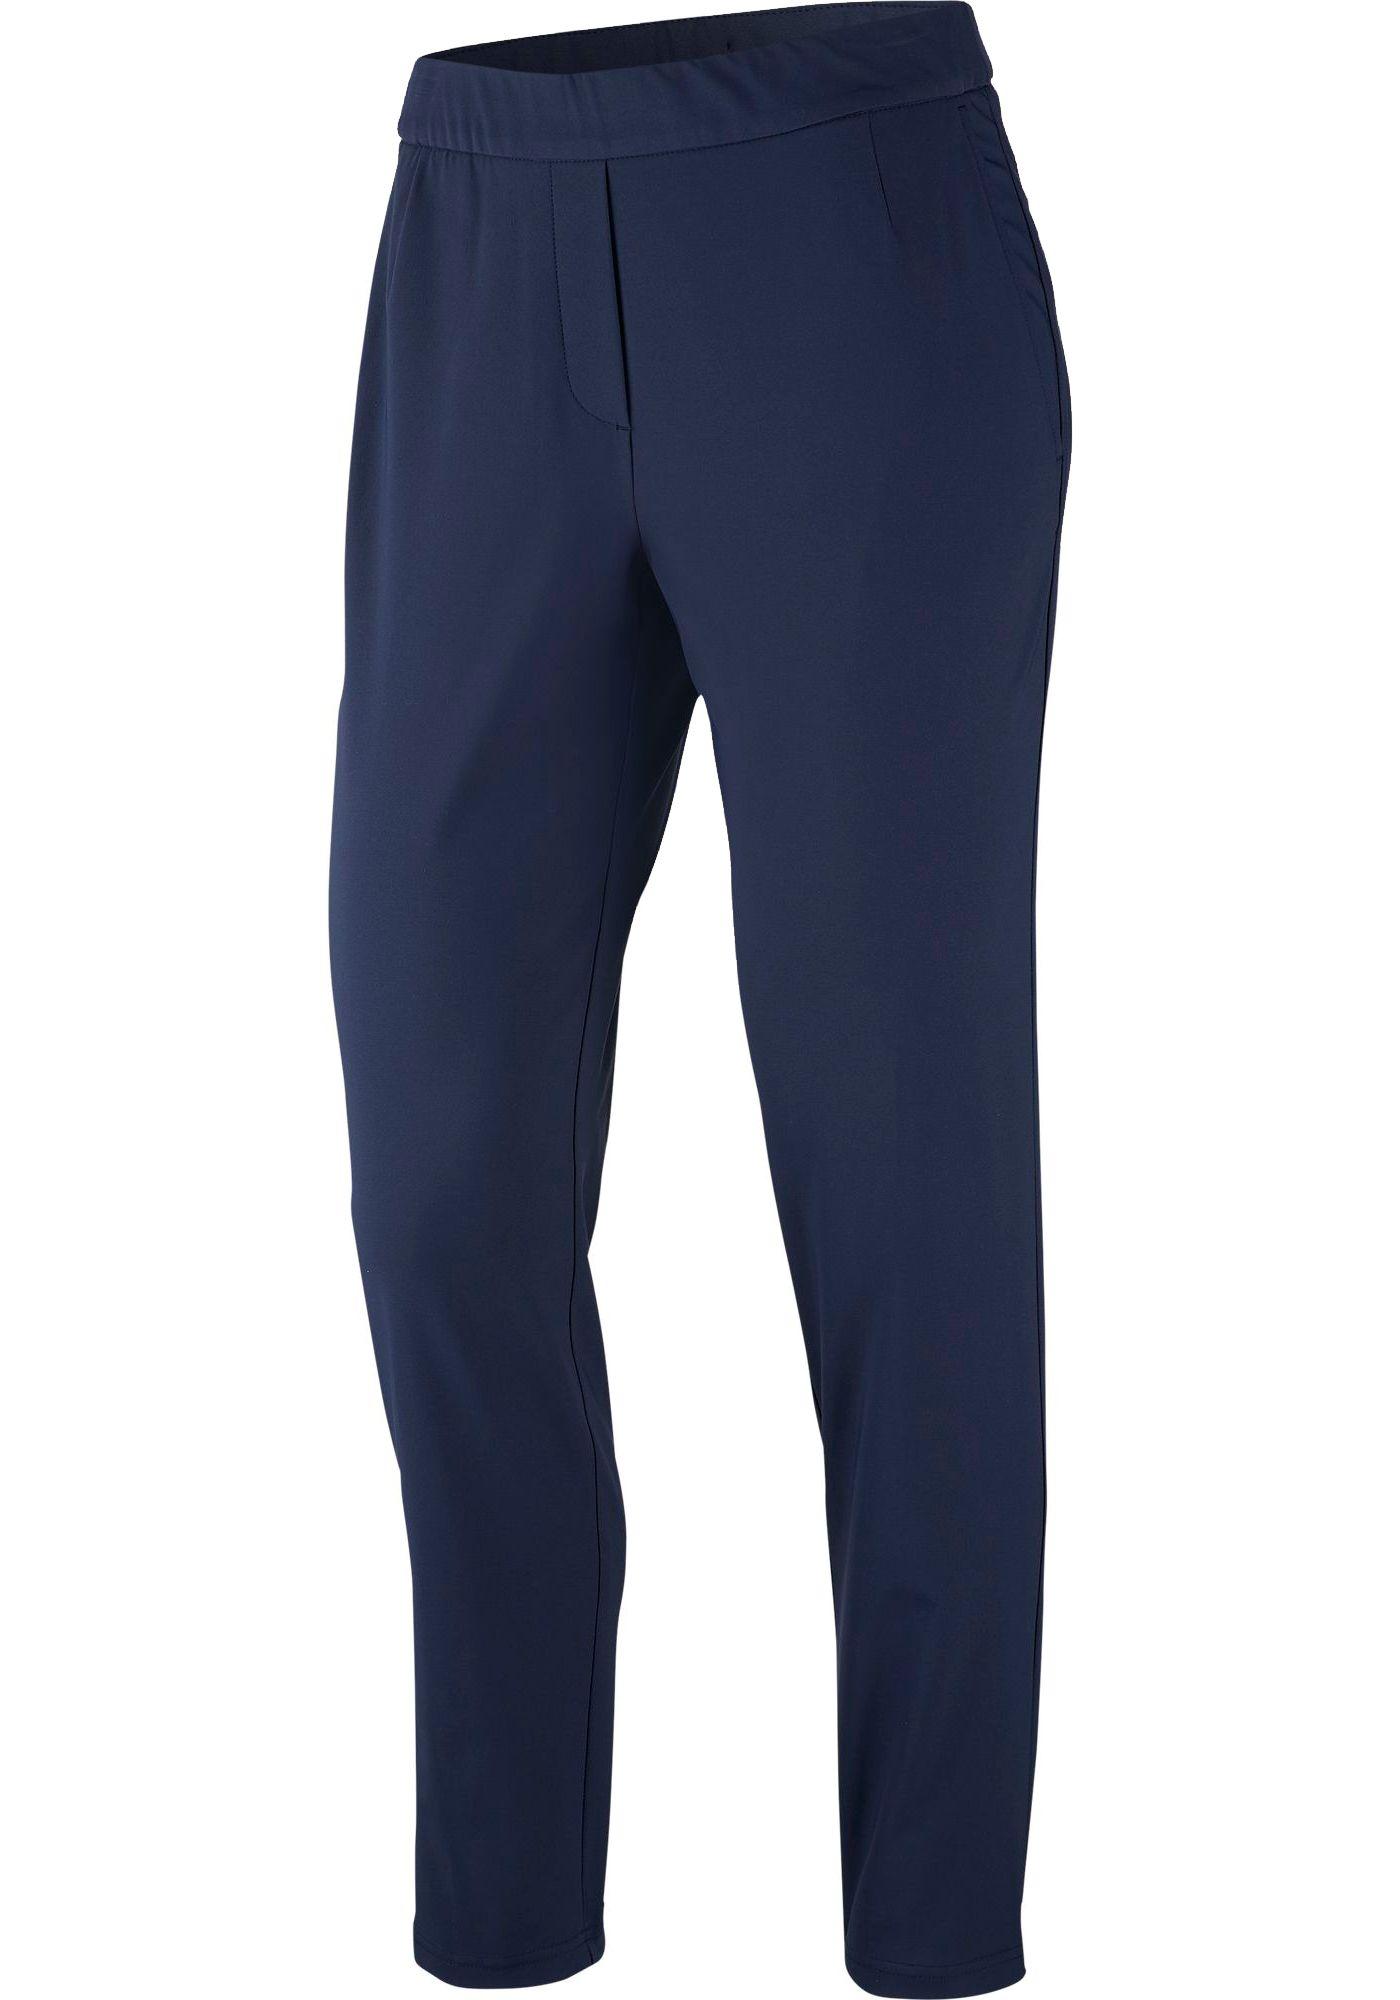 Nike Women's Flex UV Victory Golf Pants